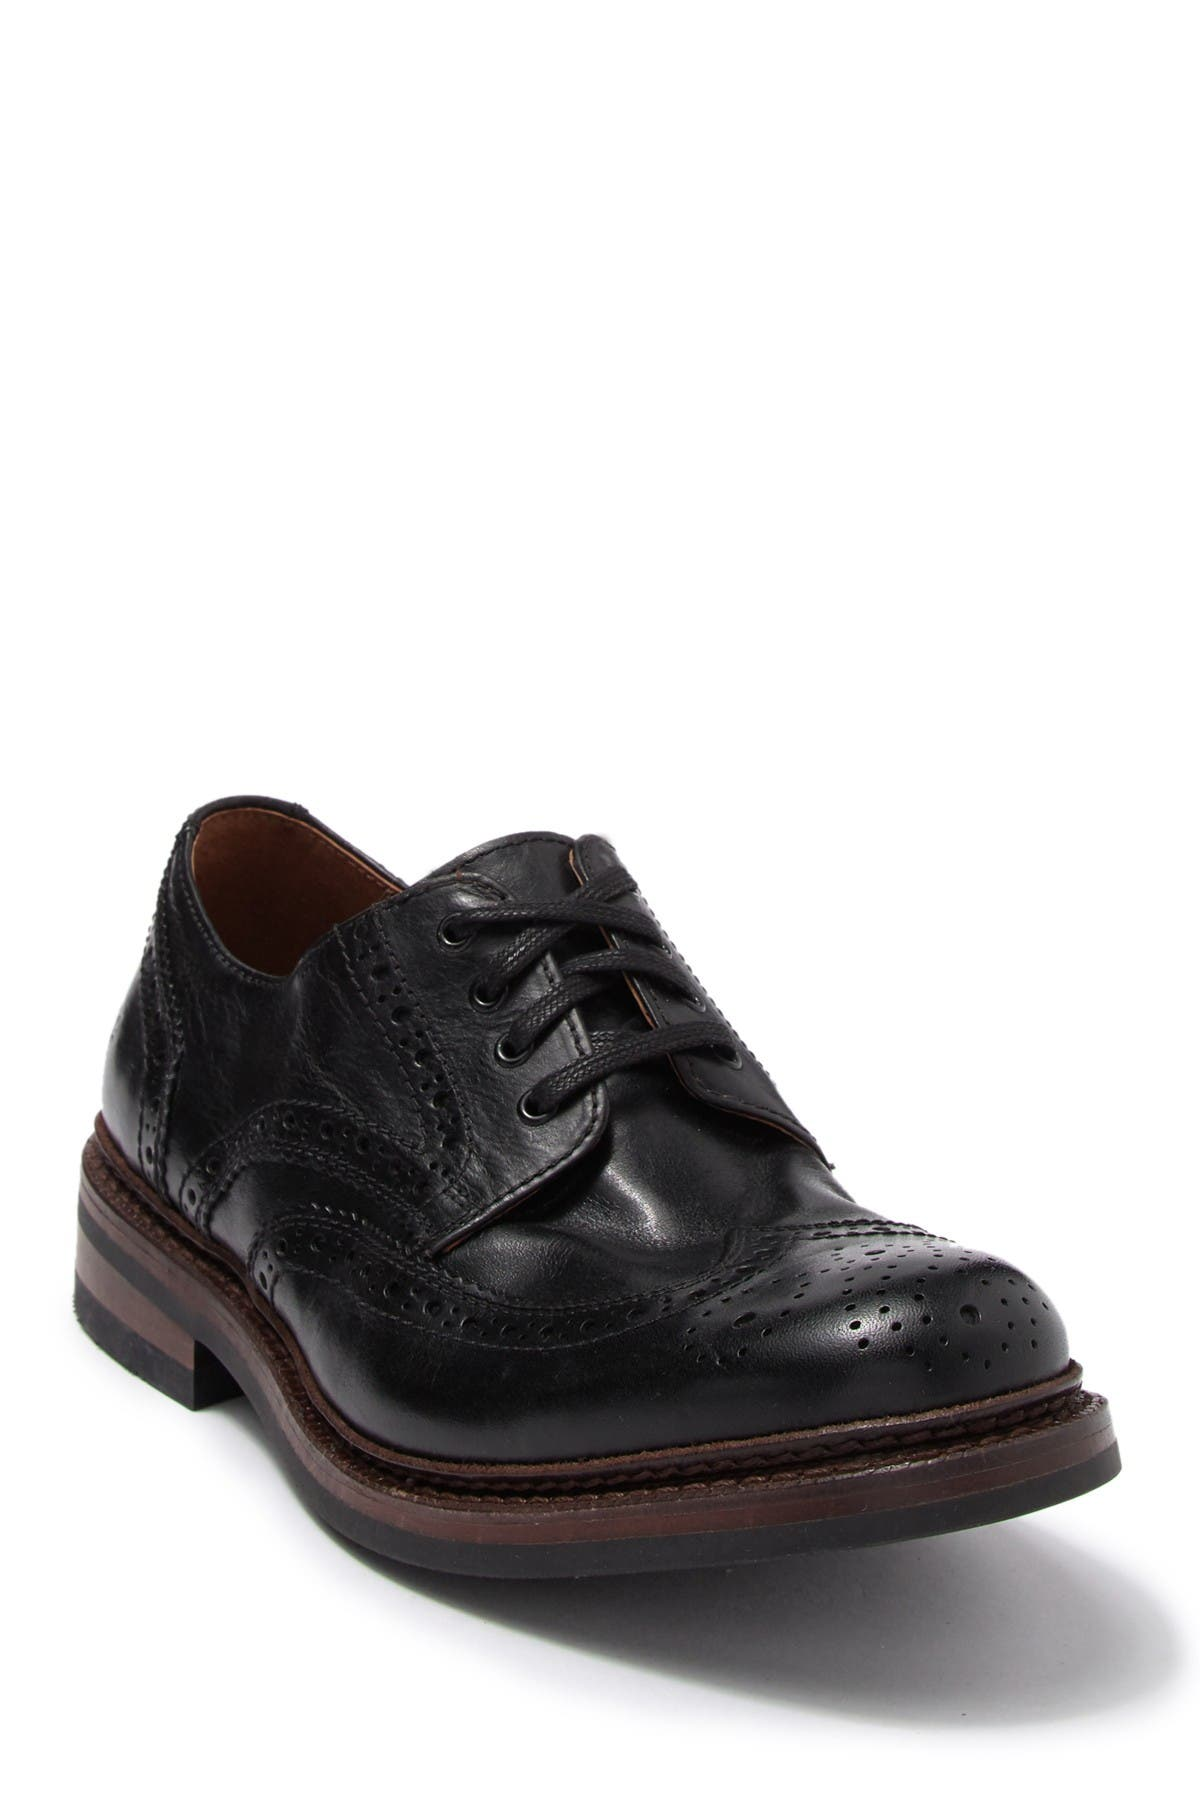 Frye | Graham Leather Wingtip Derby